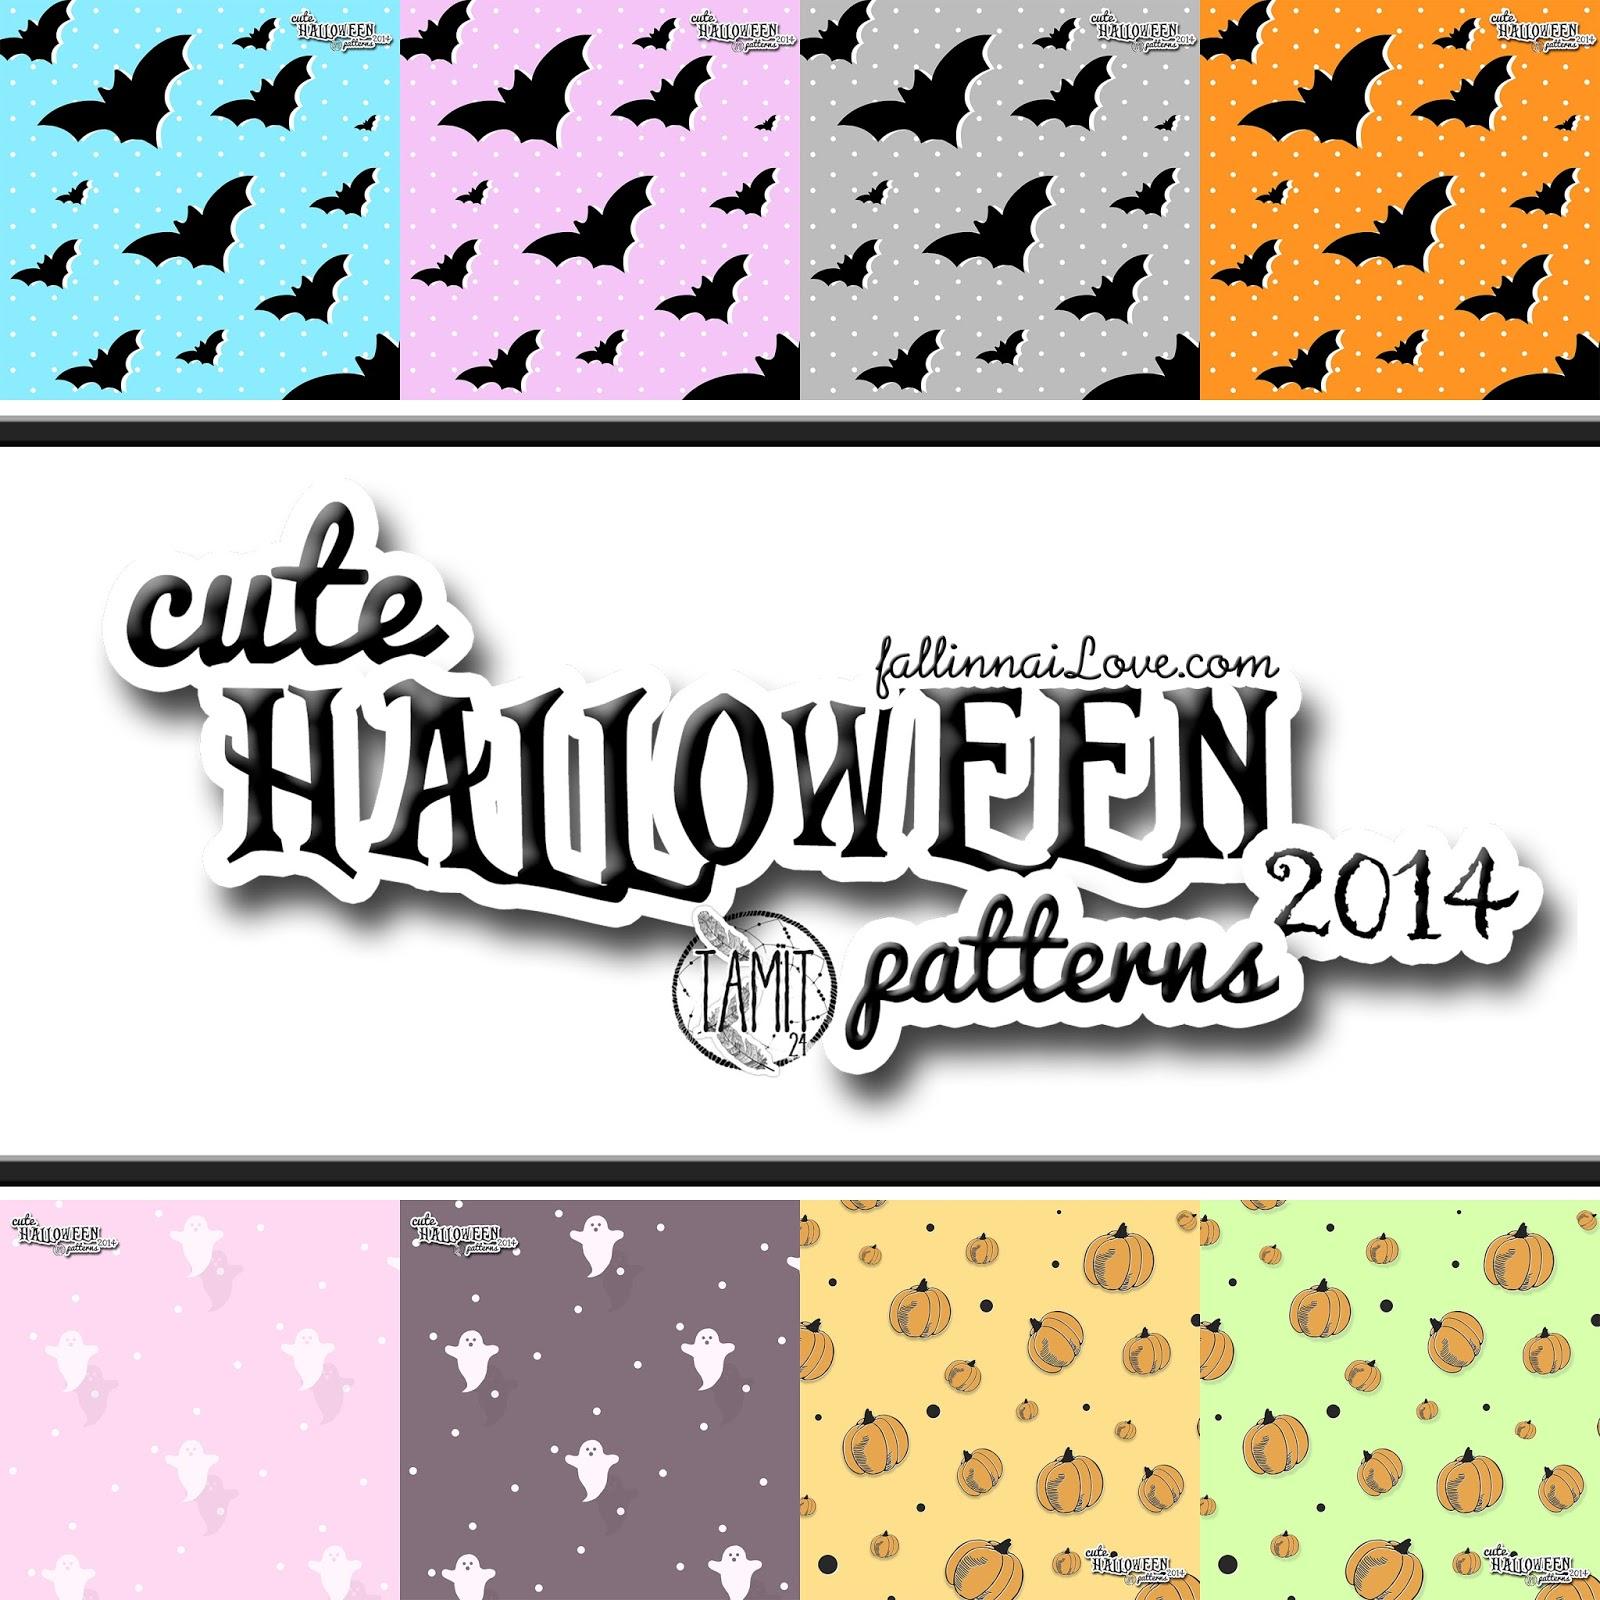 Cute Halloween Decorations Pinterest: Fall In ...naiLove!: Free CUTE HALLOWEEN PATTERNS